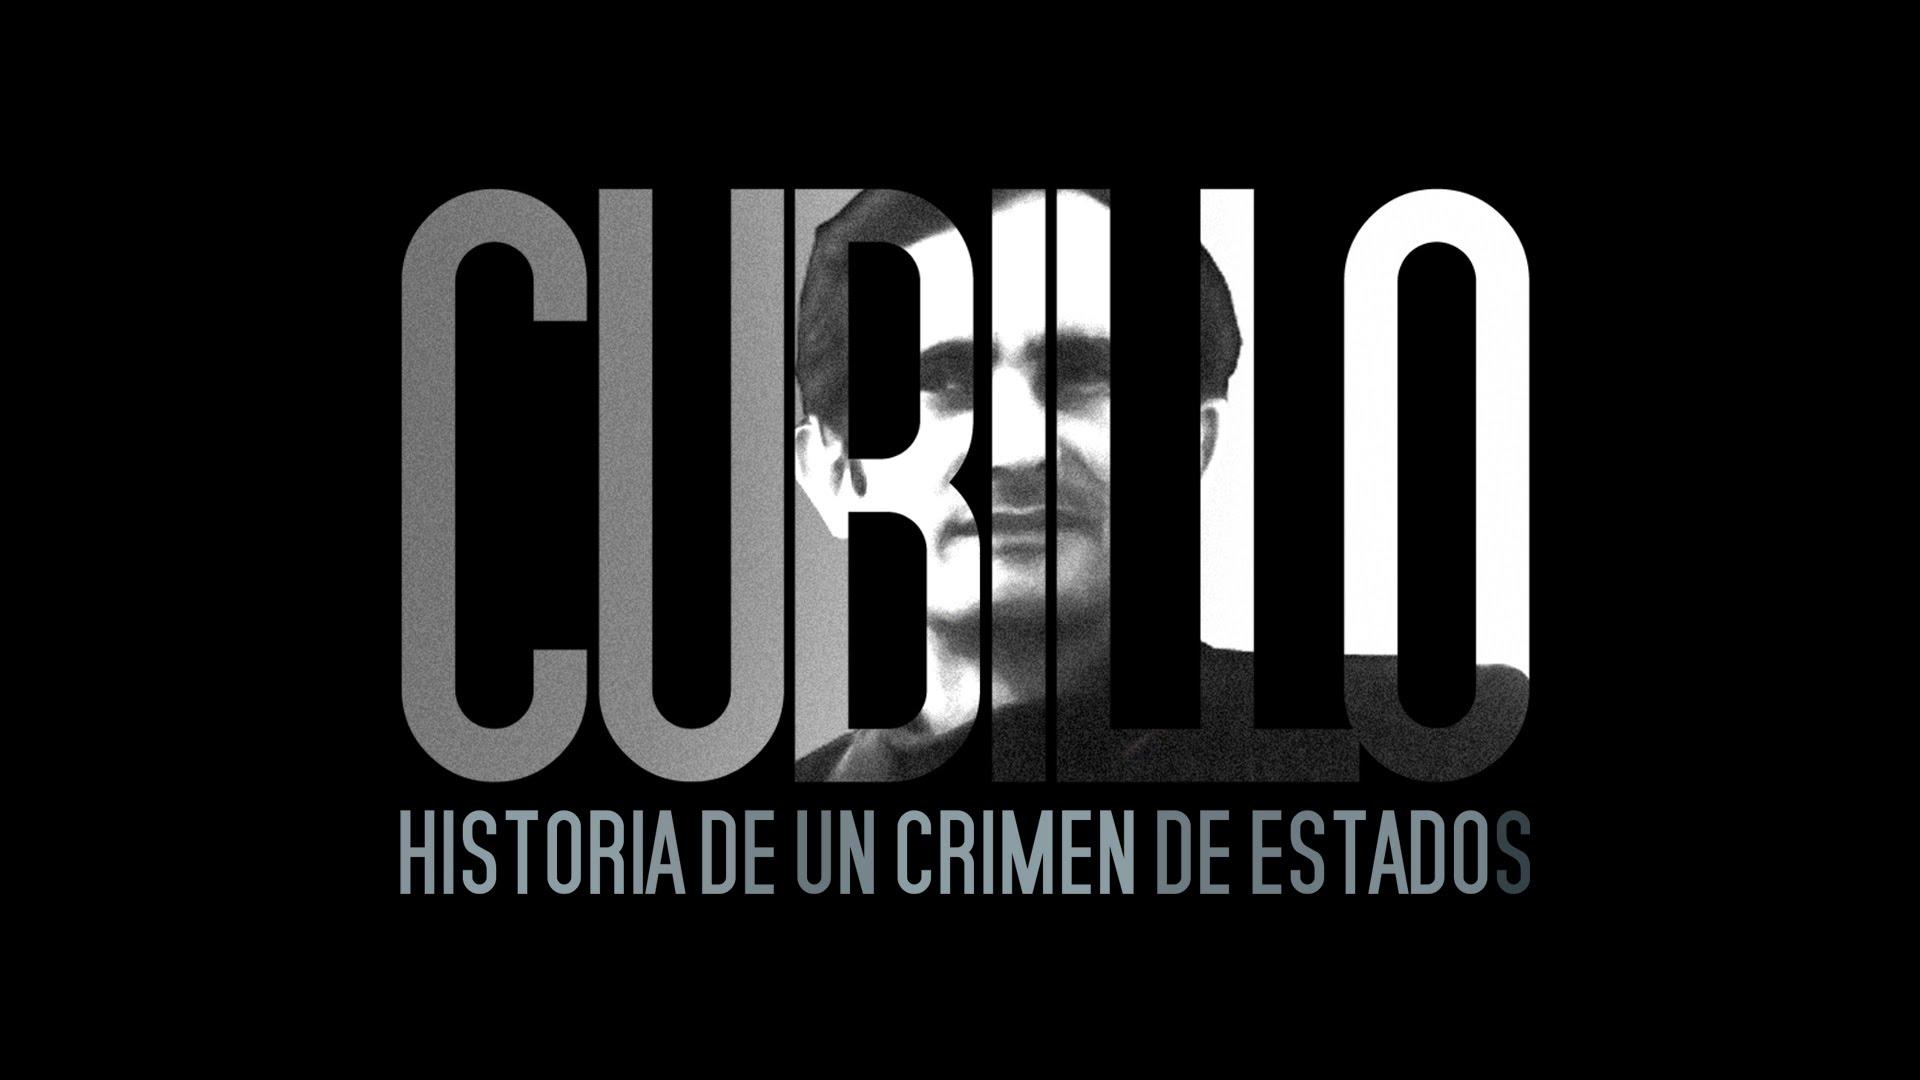 Cubillo, historia de un crimen de Estados